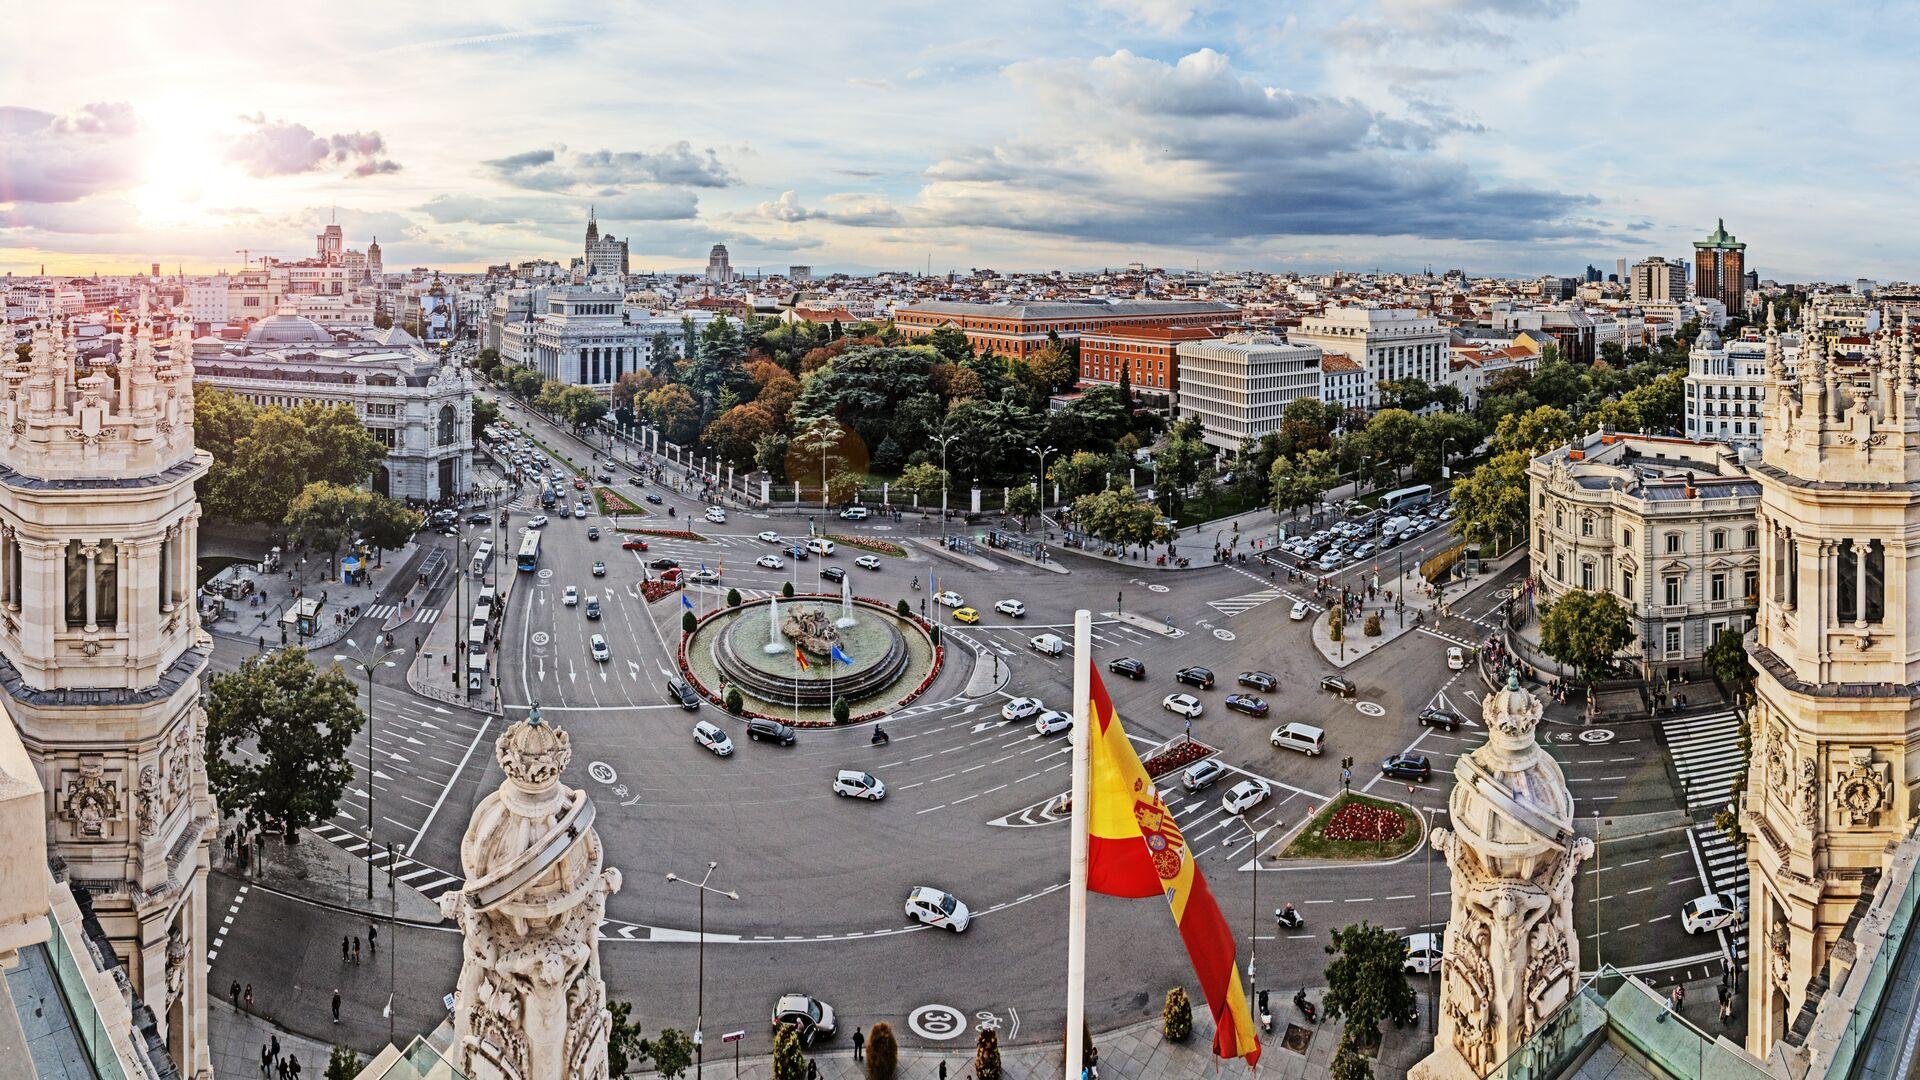 Площадь в Мадриде - РИА Новости, 1920, 06.05.2021